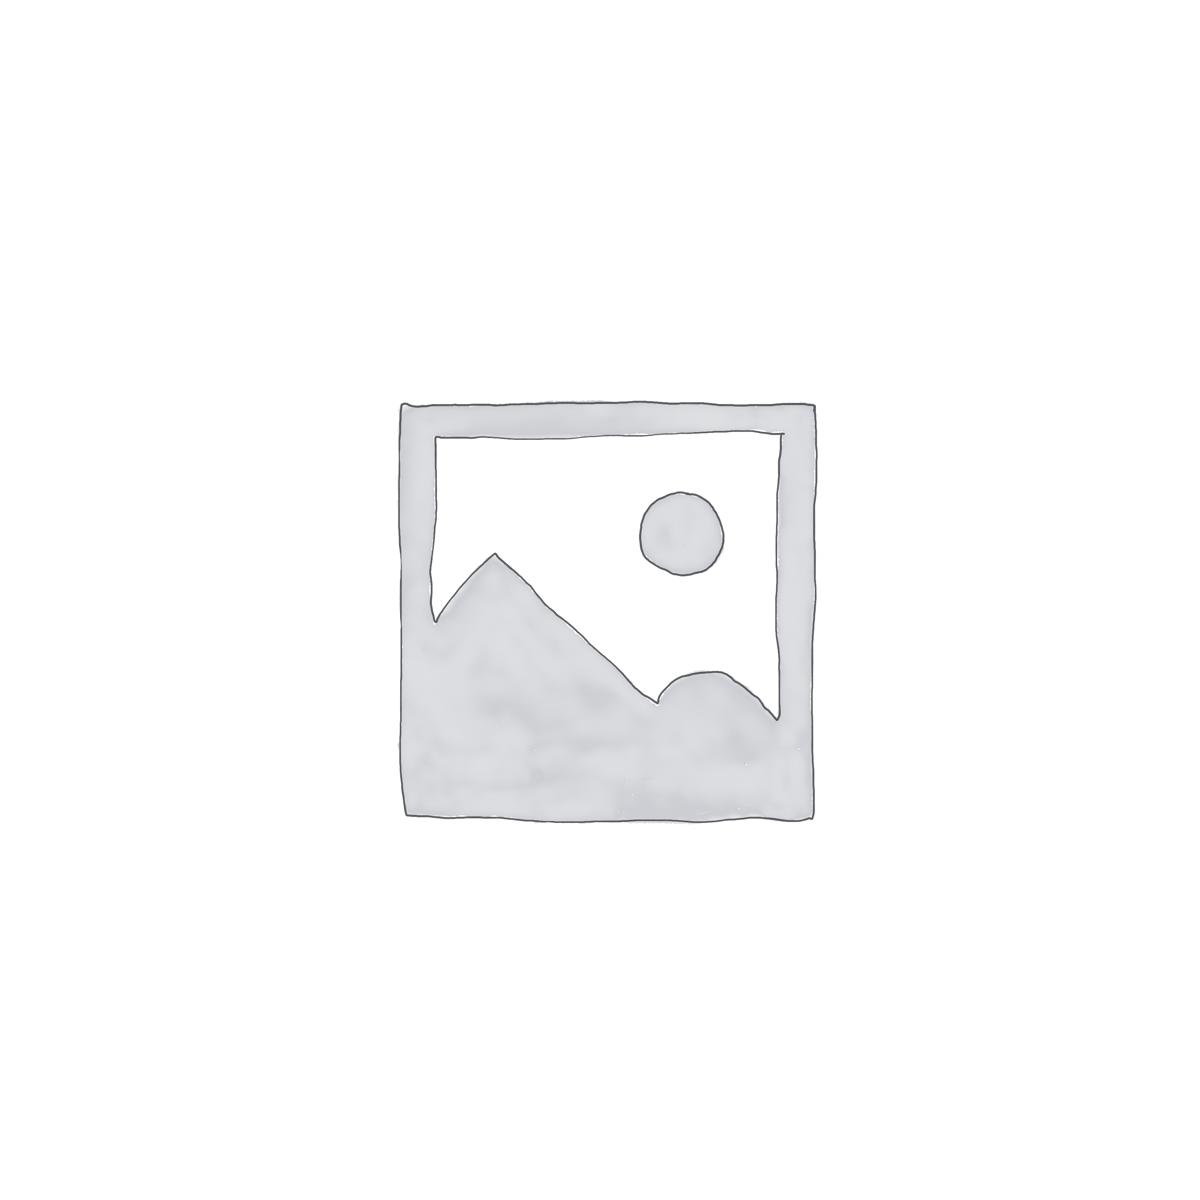 Kids Blue Brown Mountainscape with Hot Air Balloon Wallpaper Mural